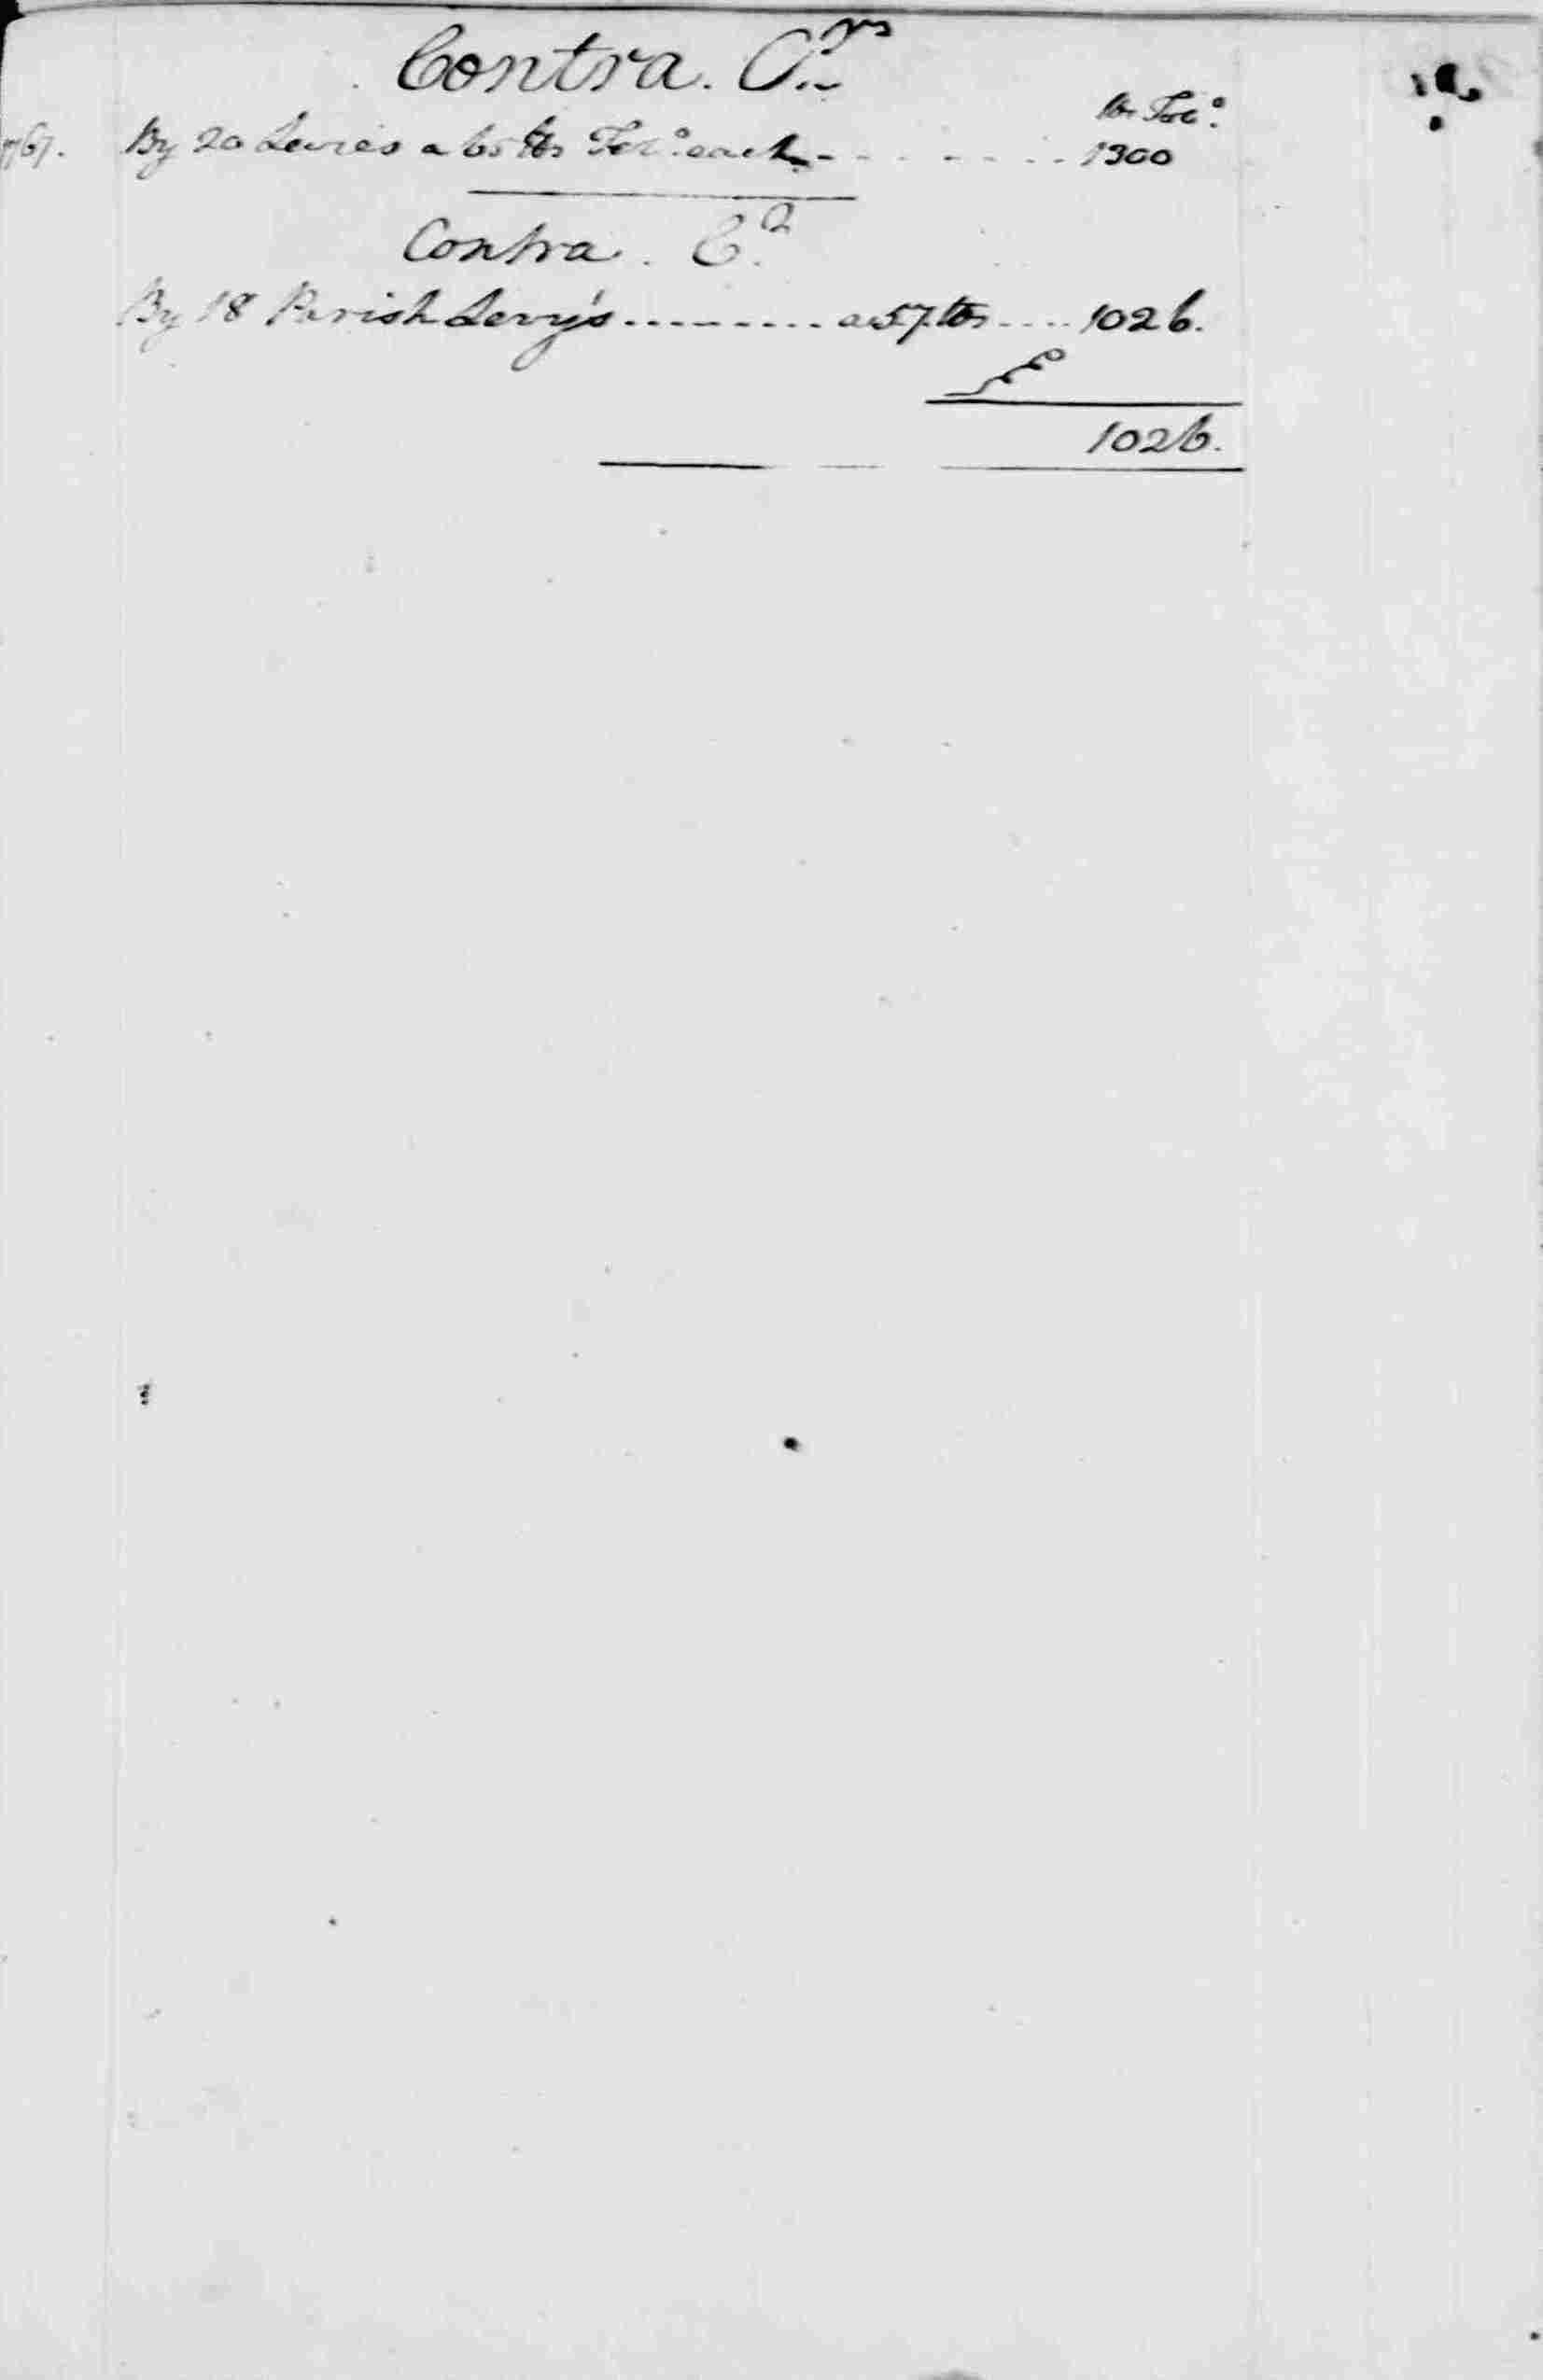 Ledger A, folio 258, right side